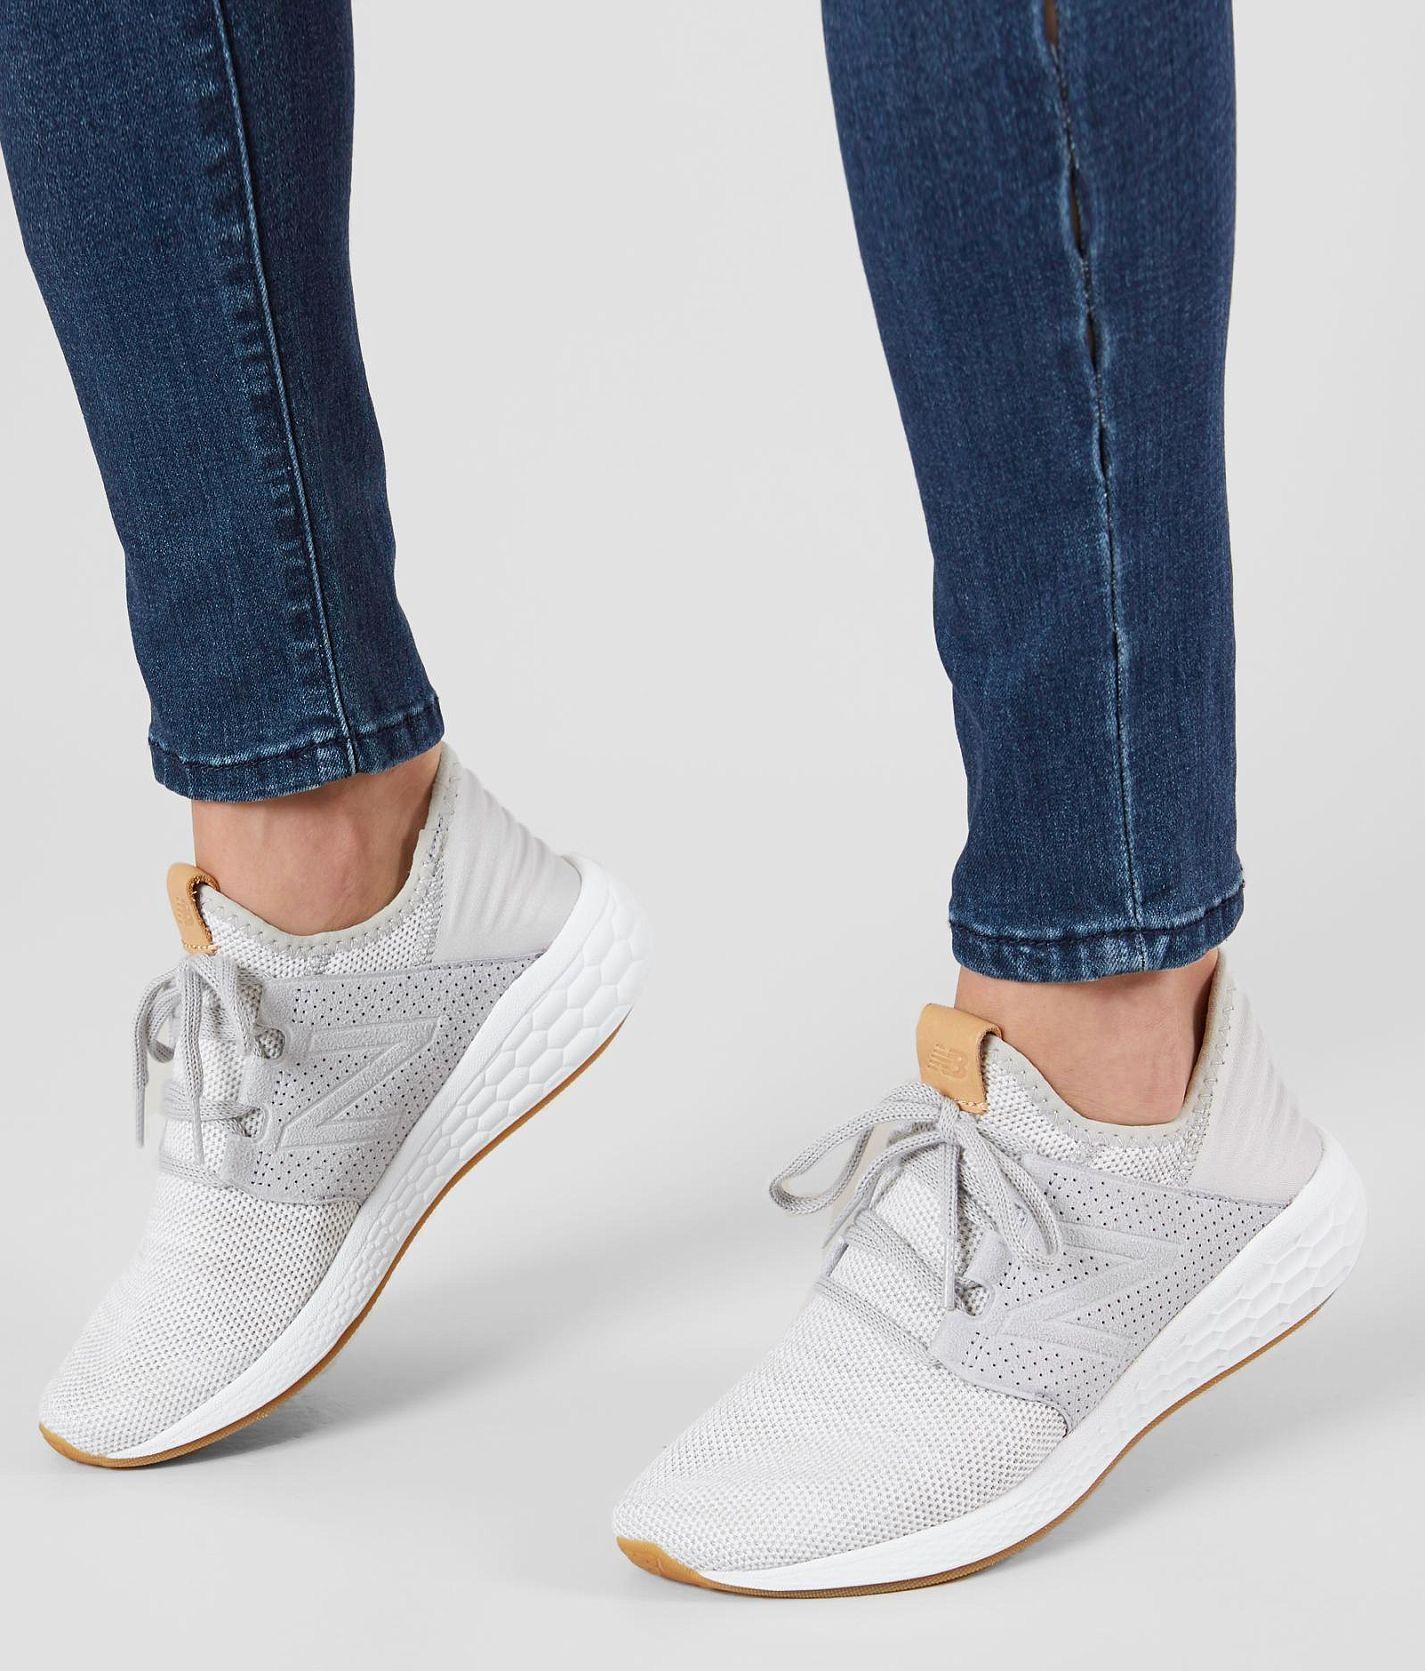 new concept e1cd1 82b57 New Balance Fresh Foam Cruz v2 Shoe - Women s Shoes in Rain Cloud Munsell  White   Buckle